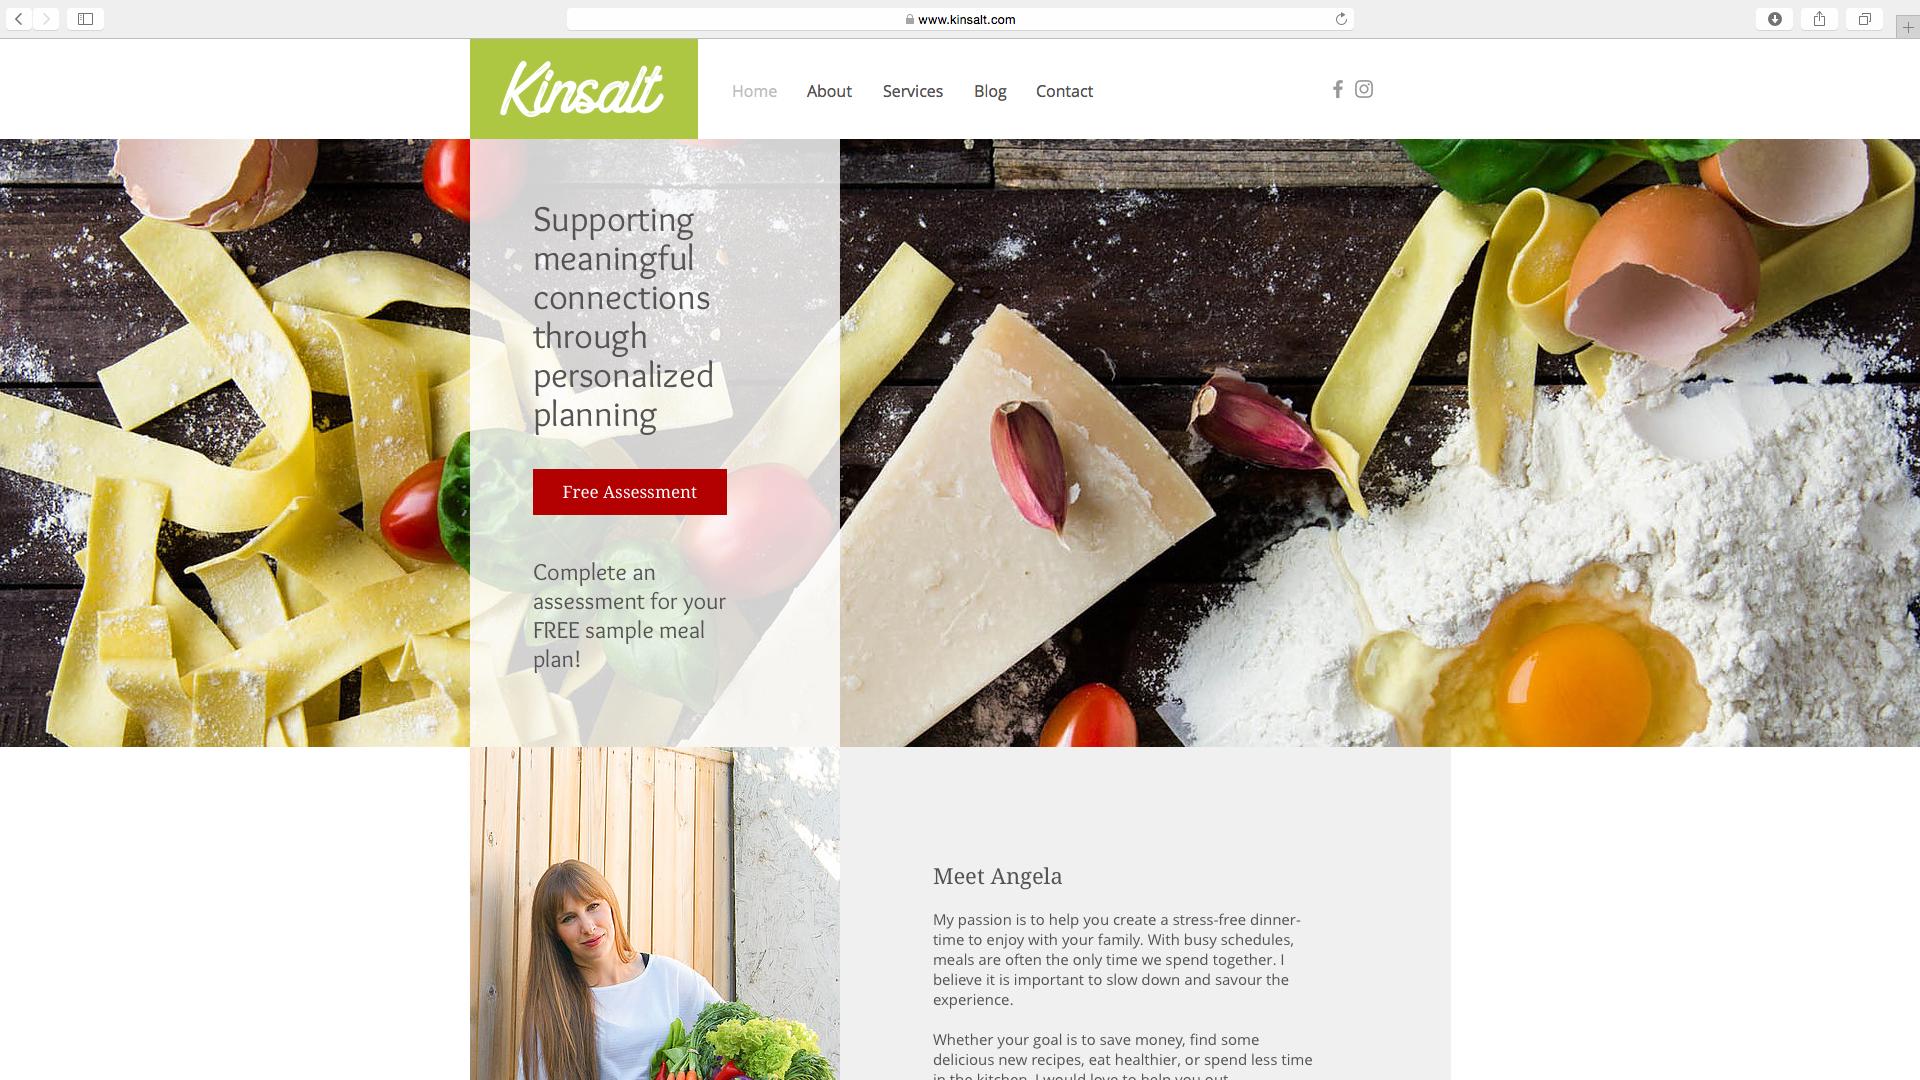 kinsalt_web_layout.png